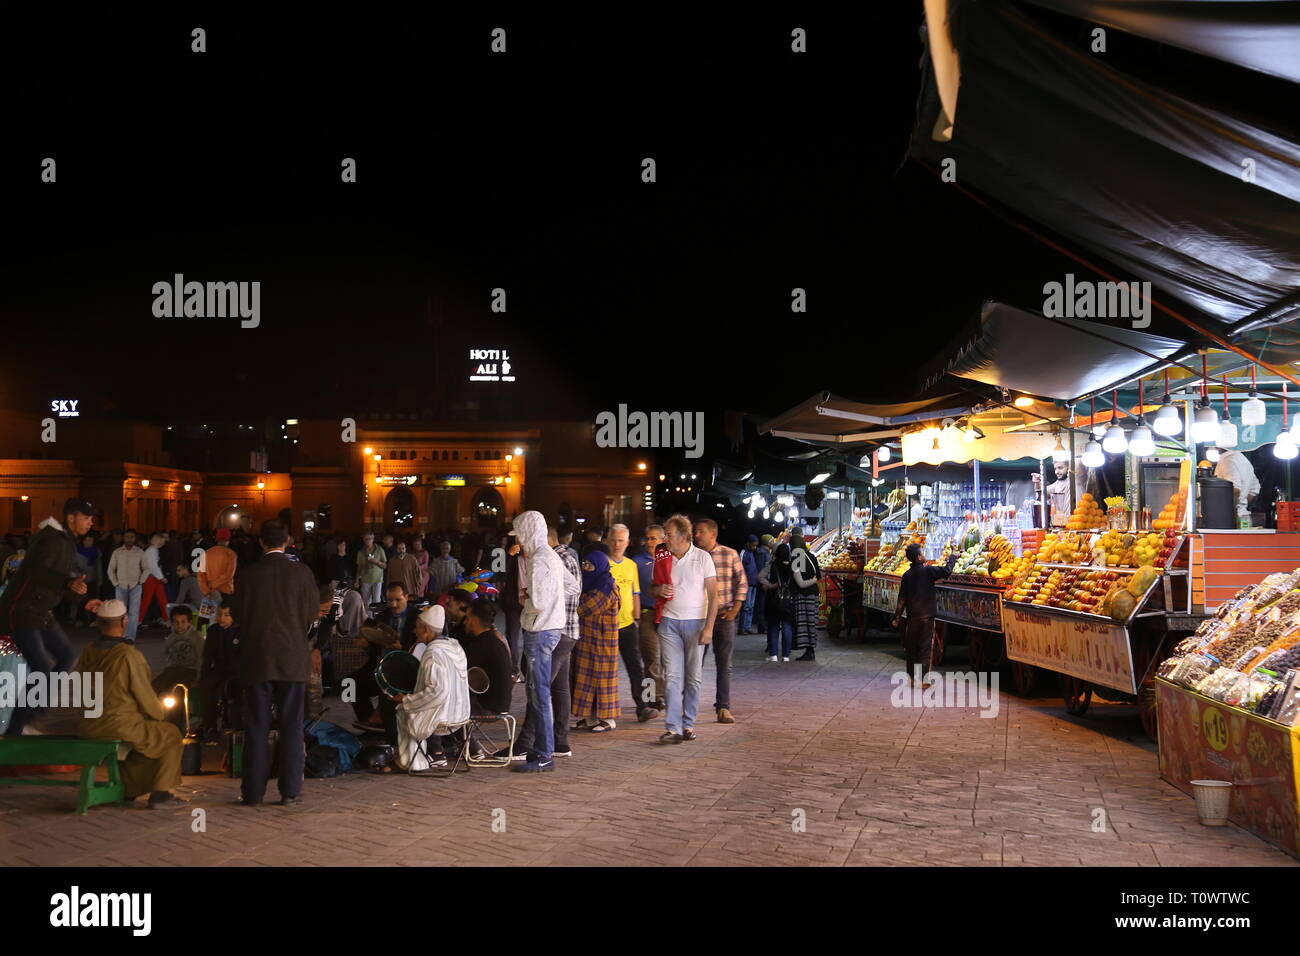 Food stalls at the Night Market, Jemaa el Fna, Medina, Marrakesh, Marrakesh-Safi region, Morocco, north Africa Stock Photo